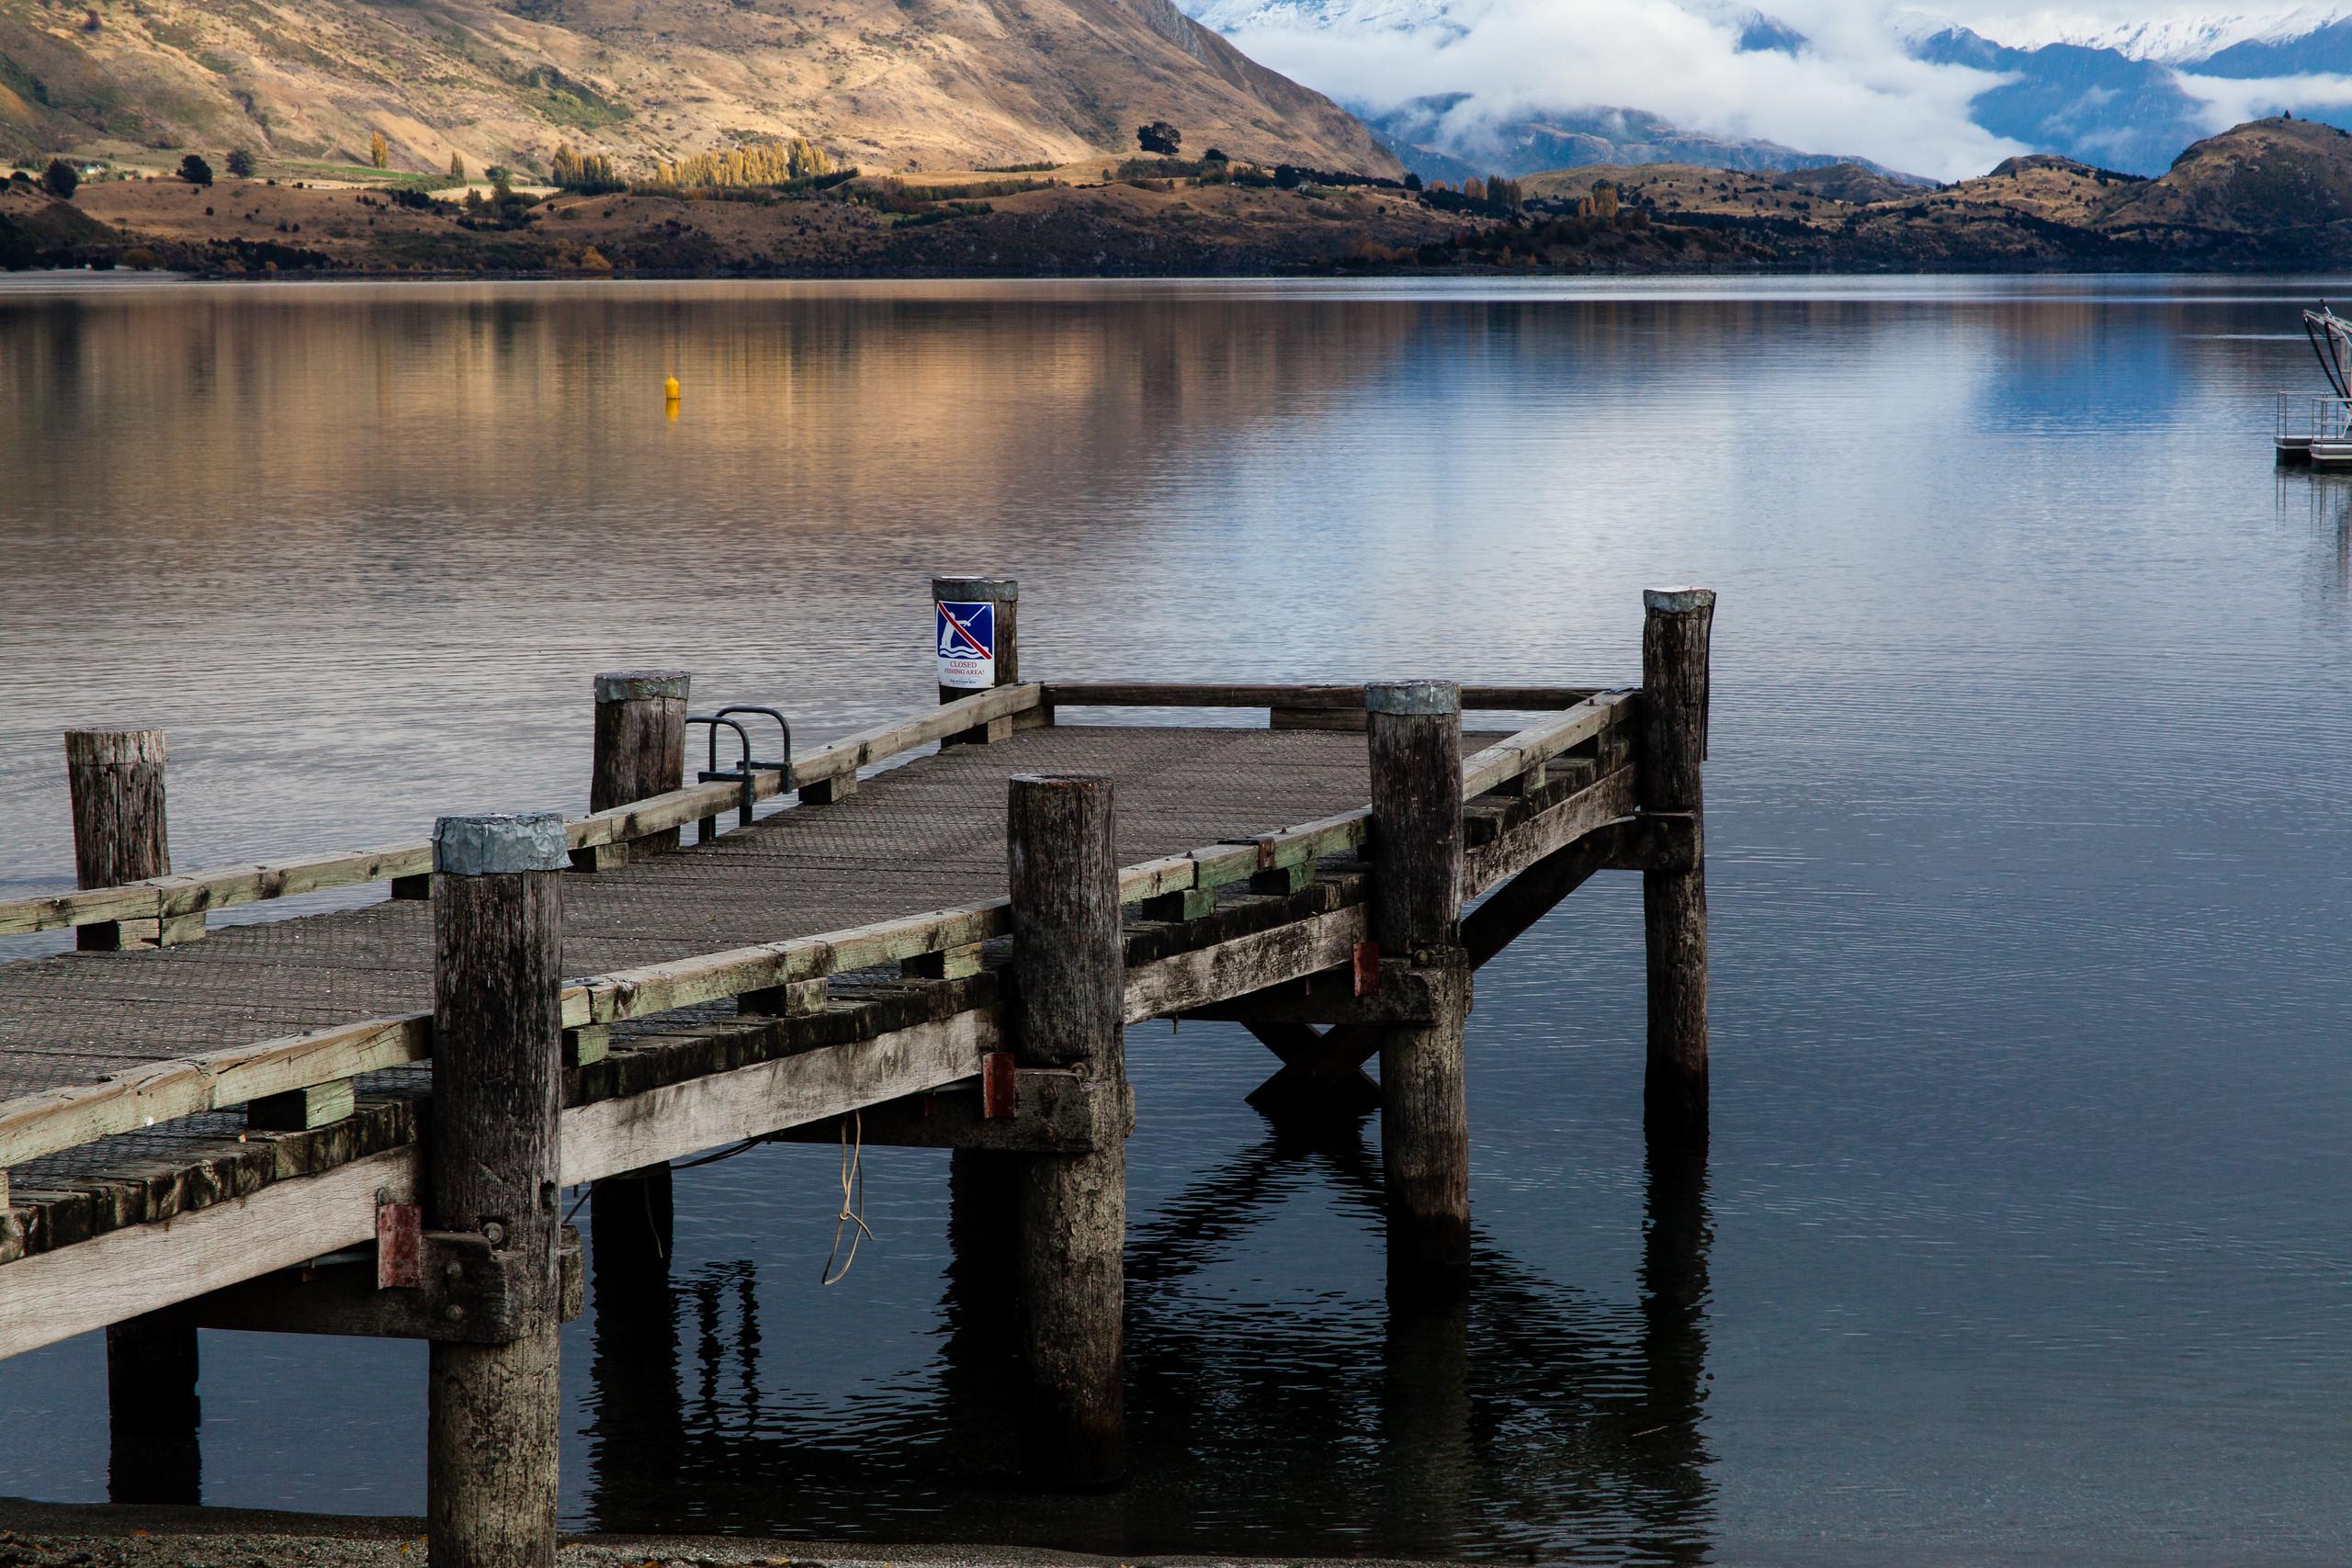 Lake Wanaka on the south Island of kiwi land.